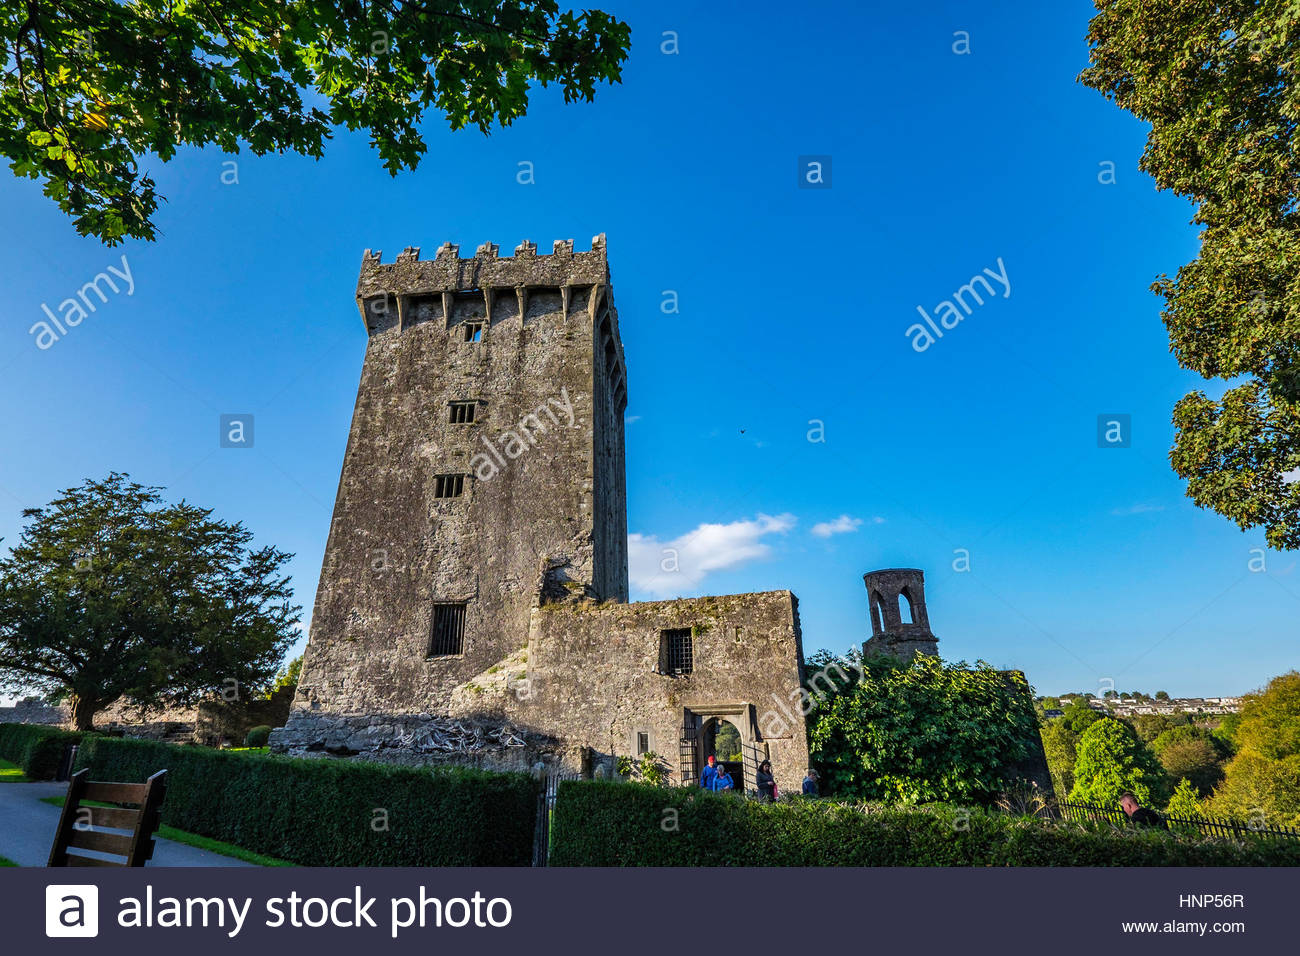 The Blarney Stone, a block of Carboniferous limestone built into the battlements of Blarney Castle, Blarney, Ireland. - Stock Image